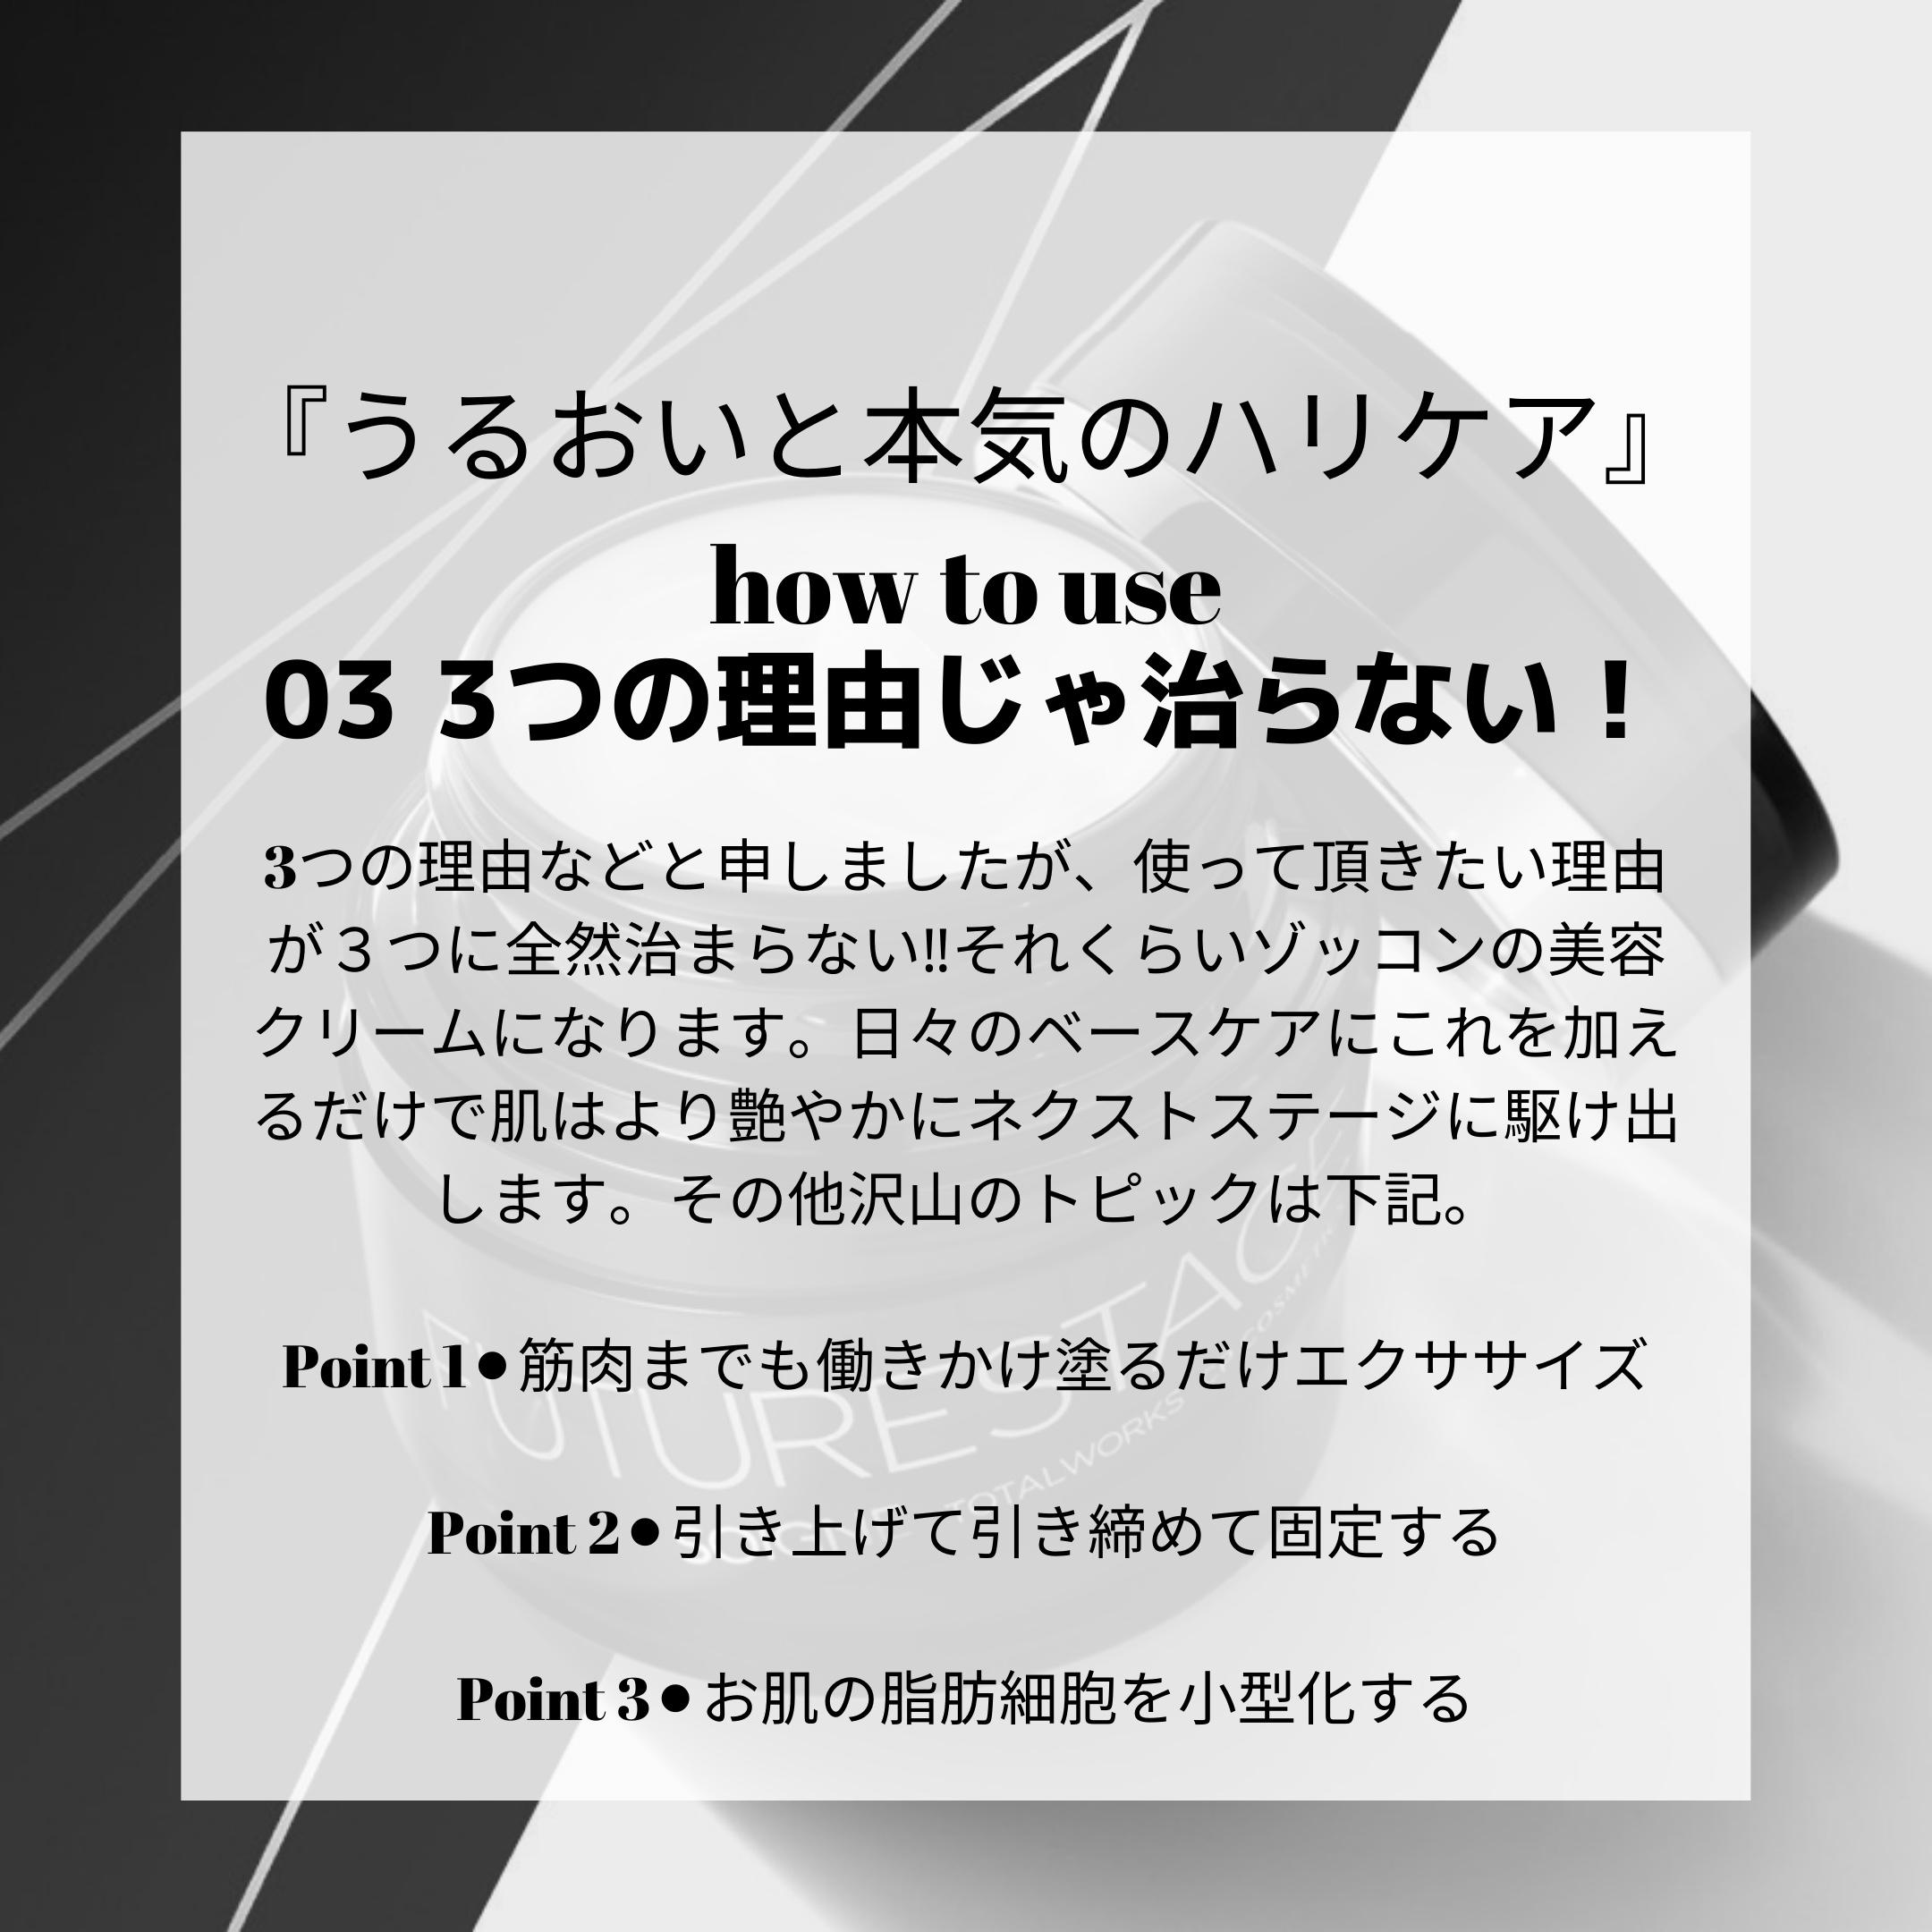 fc2blog_20201029202020858.jpg